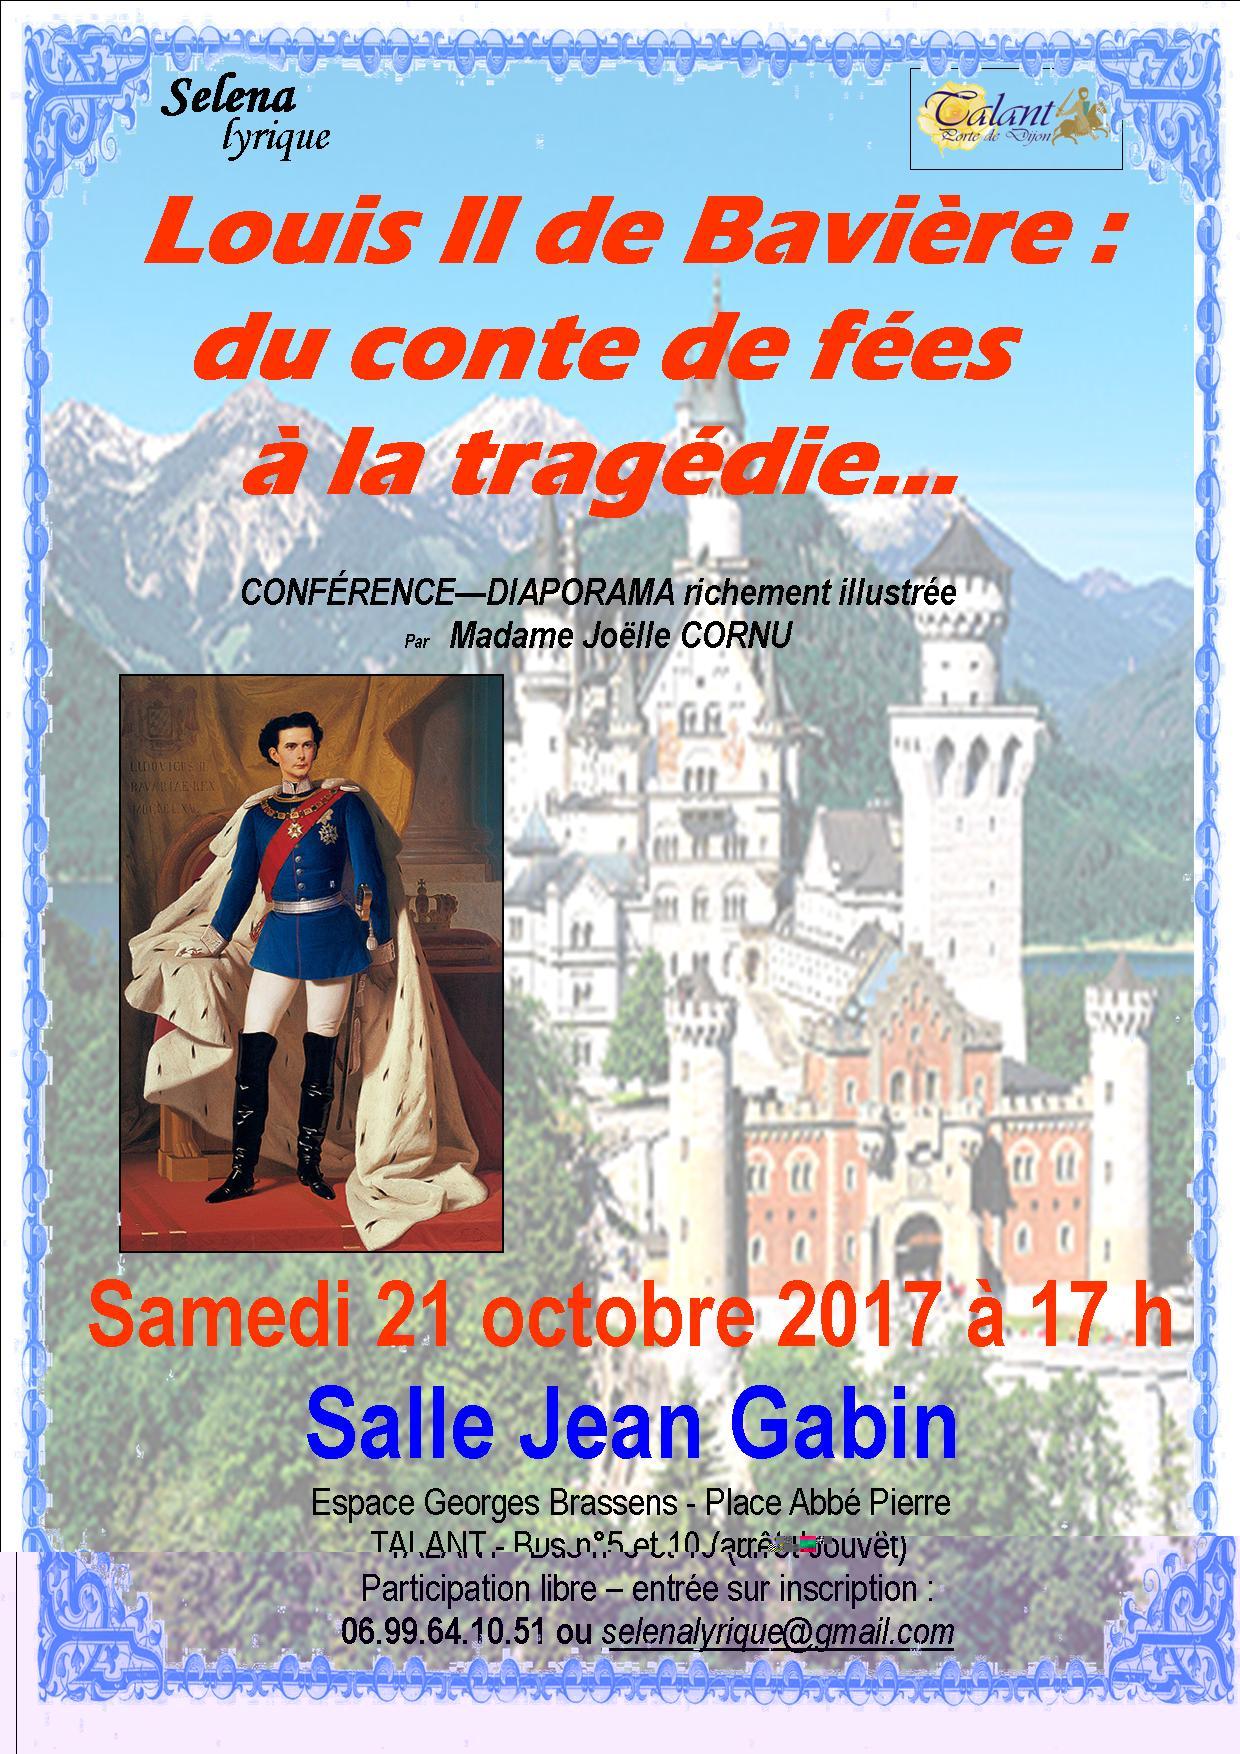 Louis II   aFFIC HETTE avec château  2 (1) (1) (1)